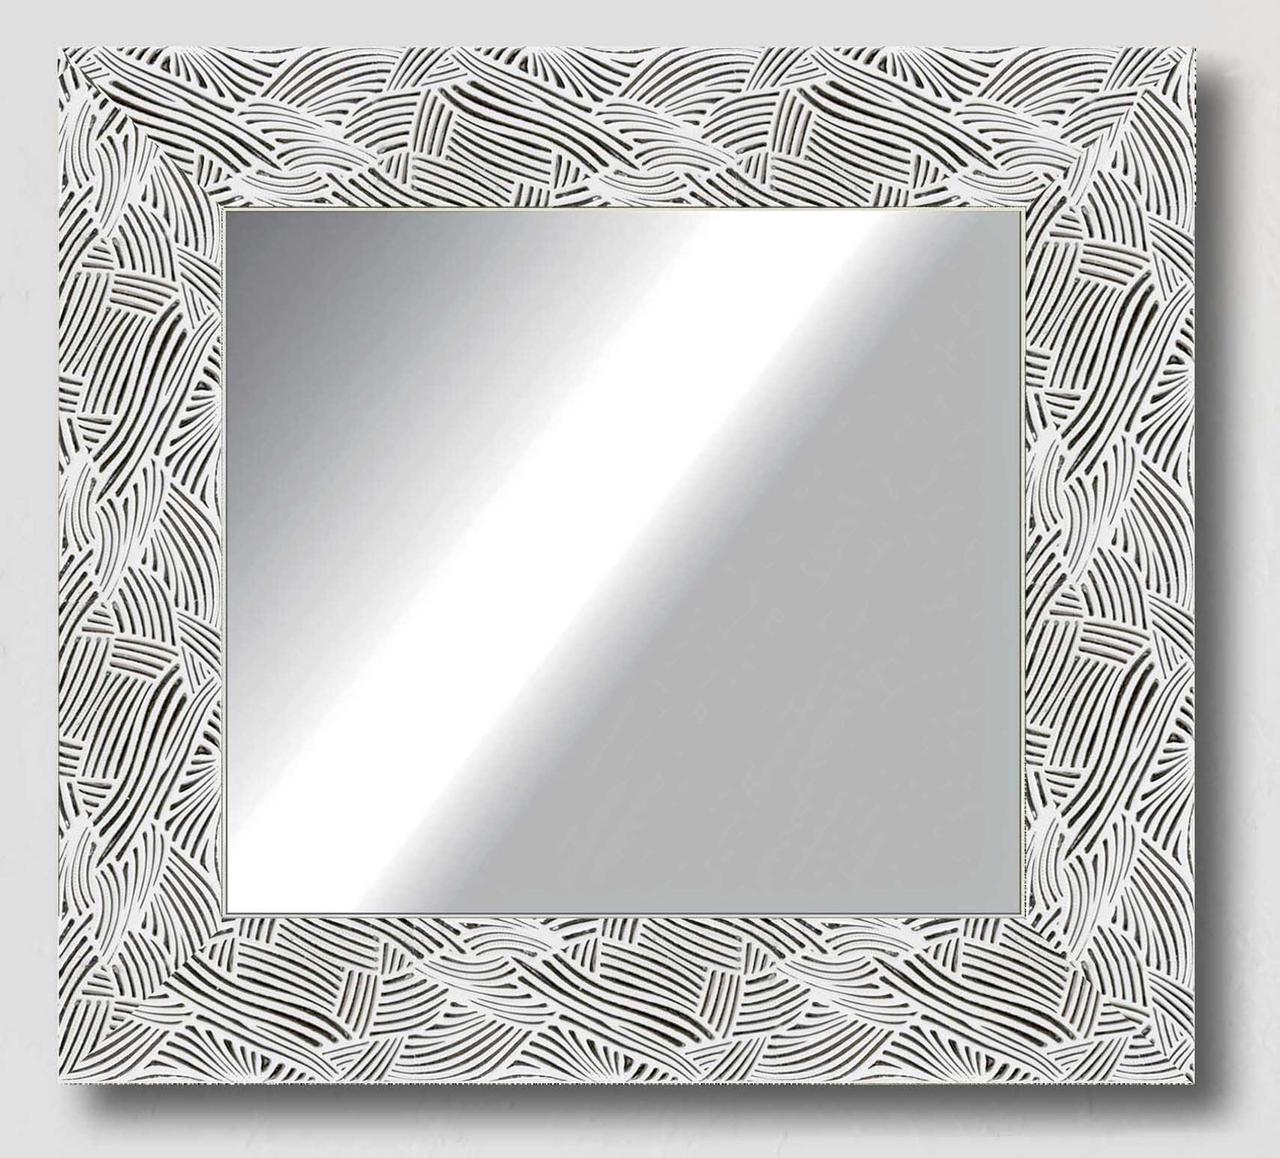 Зеркало настенное в раме Factura White pattern 50.5х50.5 см белое